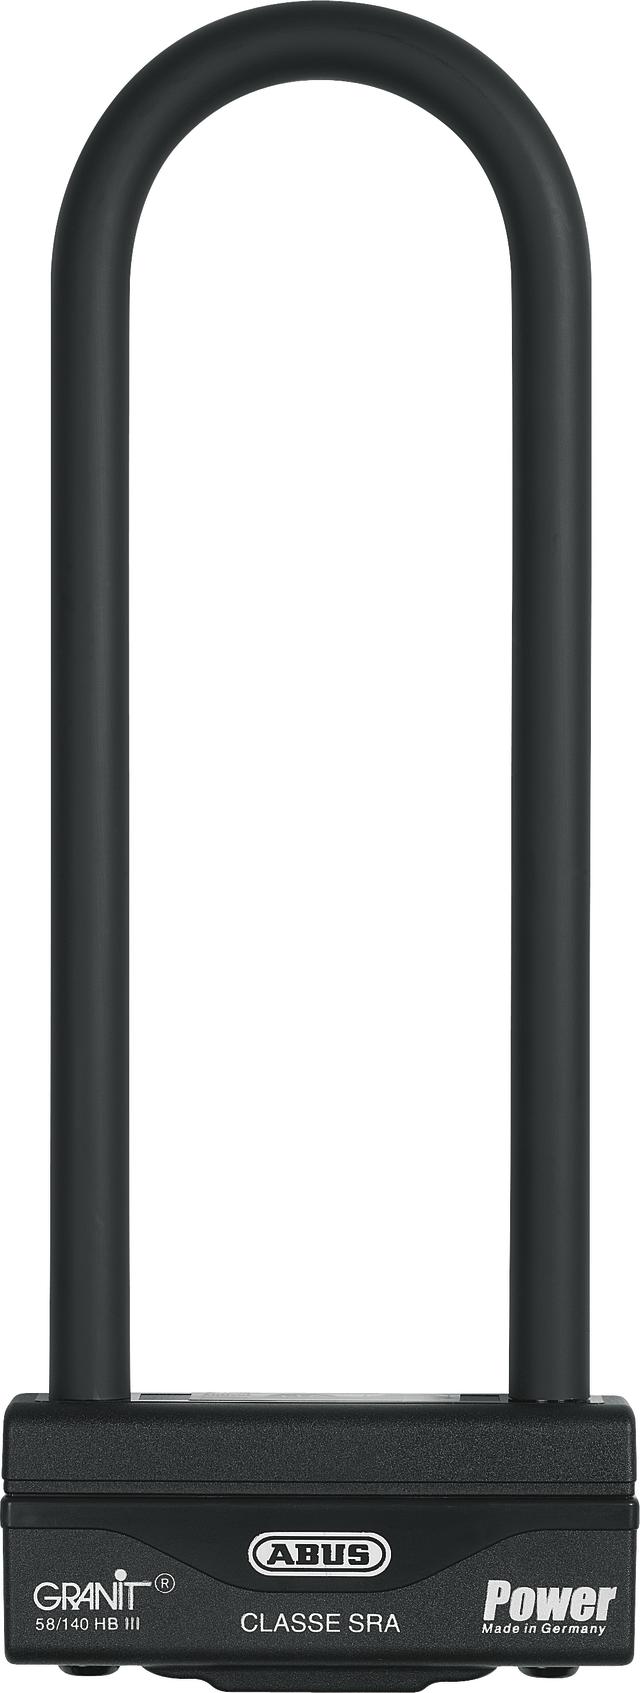 GRANIT™ Power 58/140HBIII310